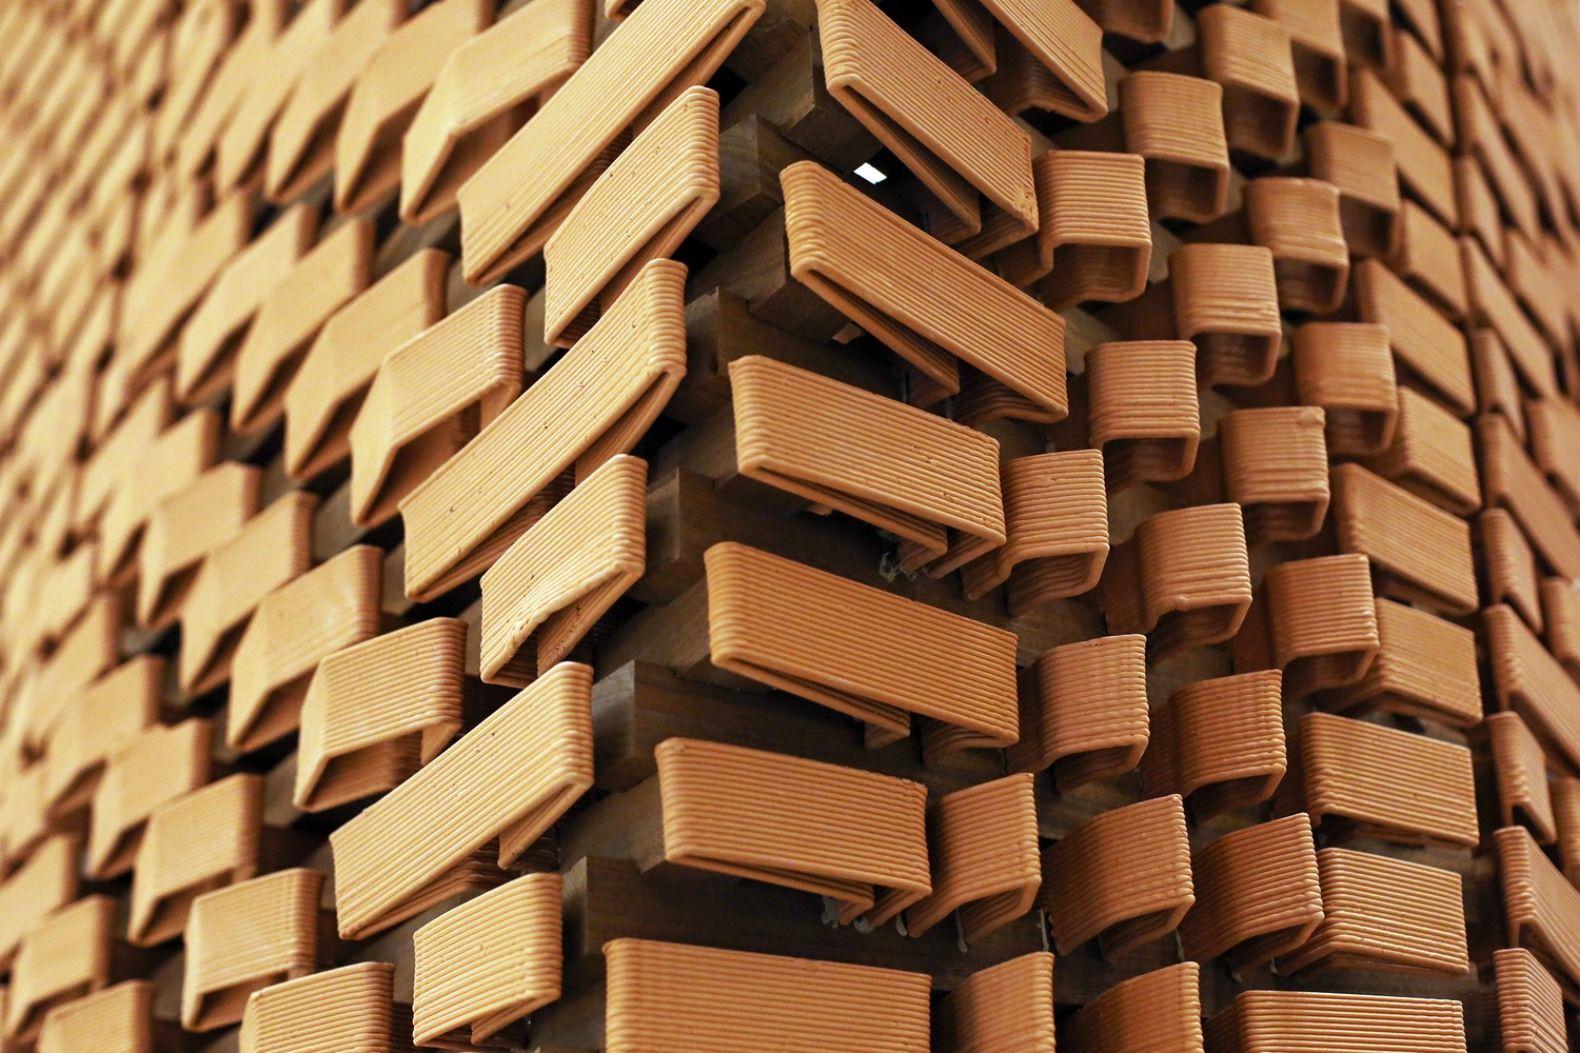 3d Printing Bricks Google Search In 2020